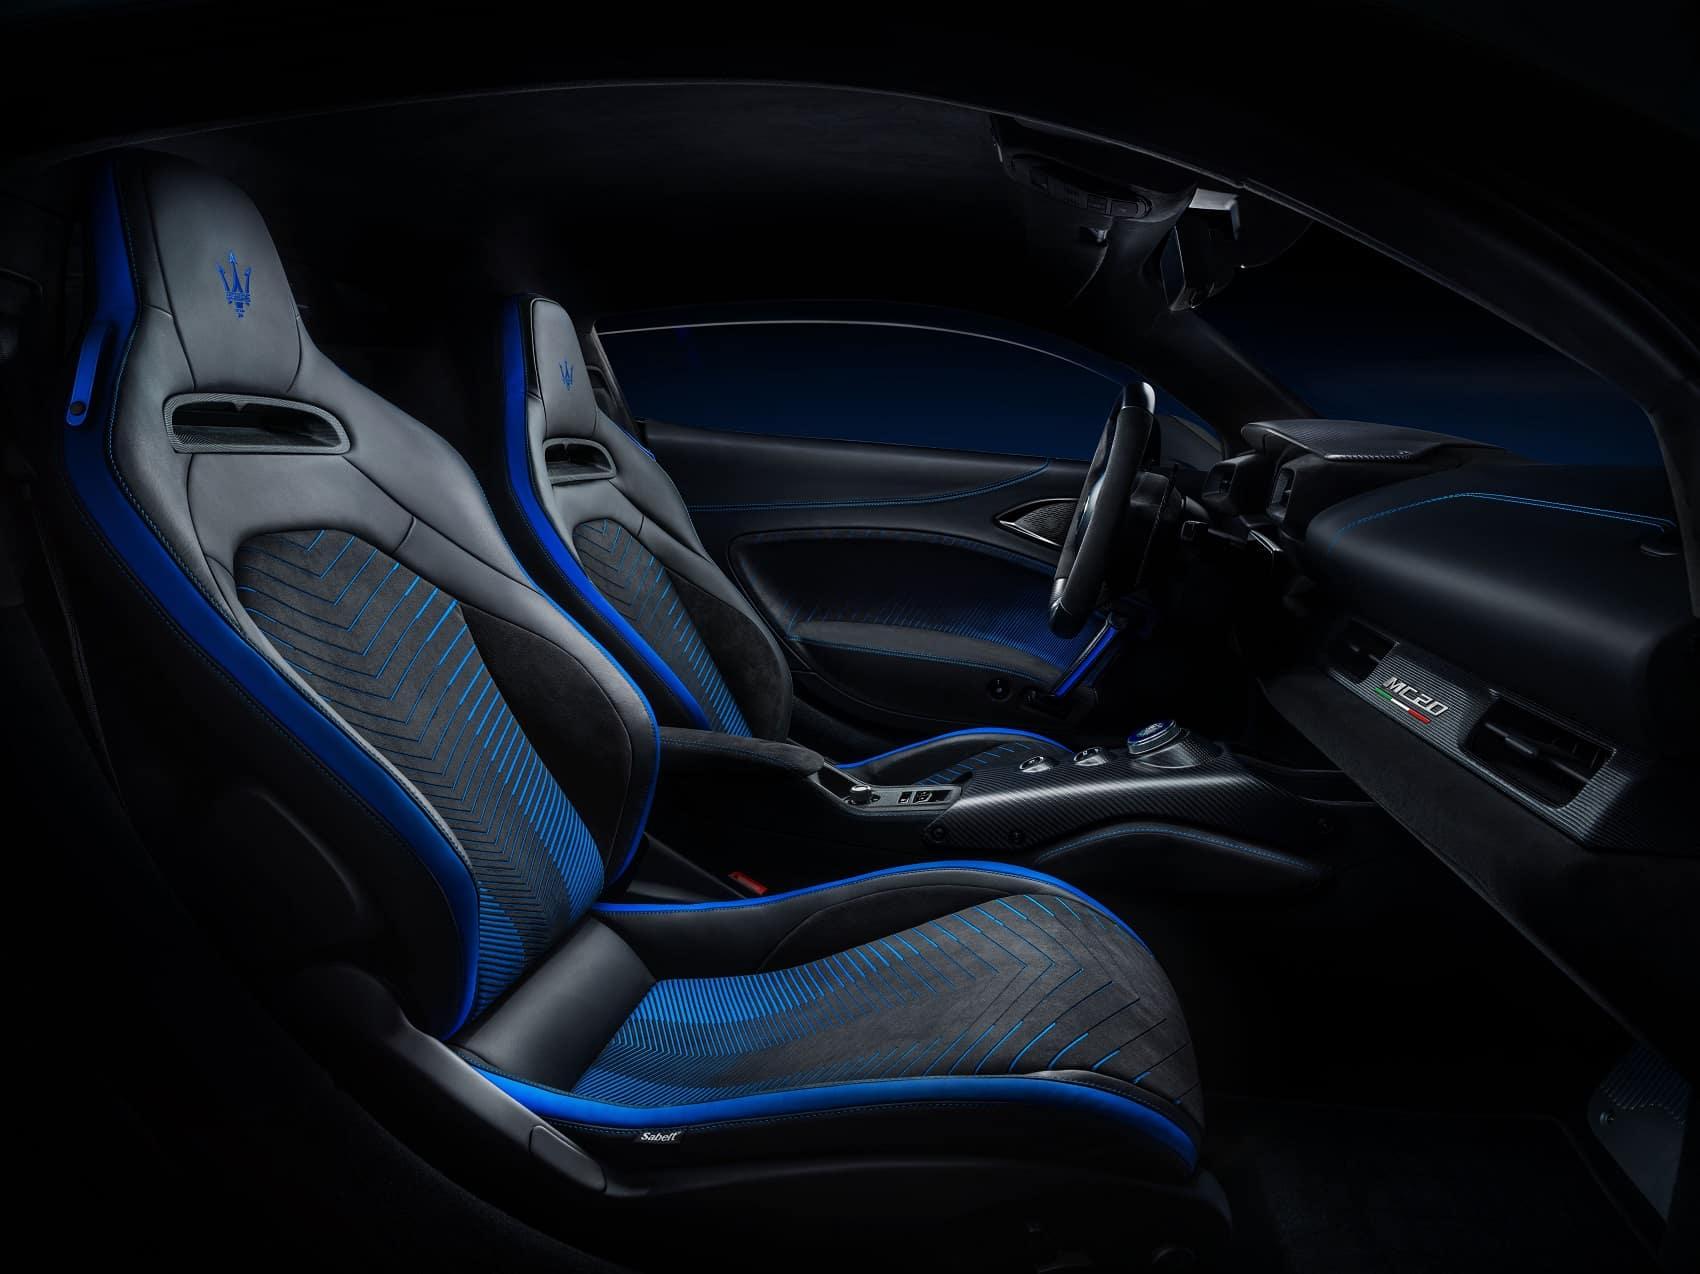 2020 Maserati MC20 Interior